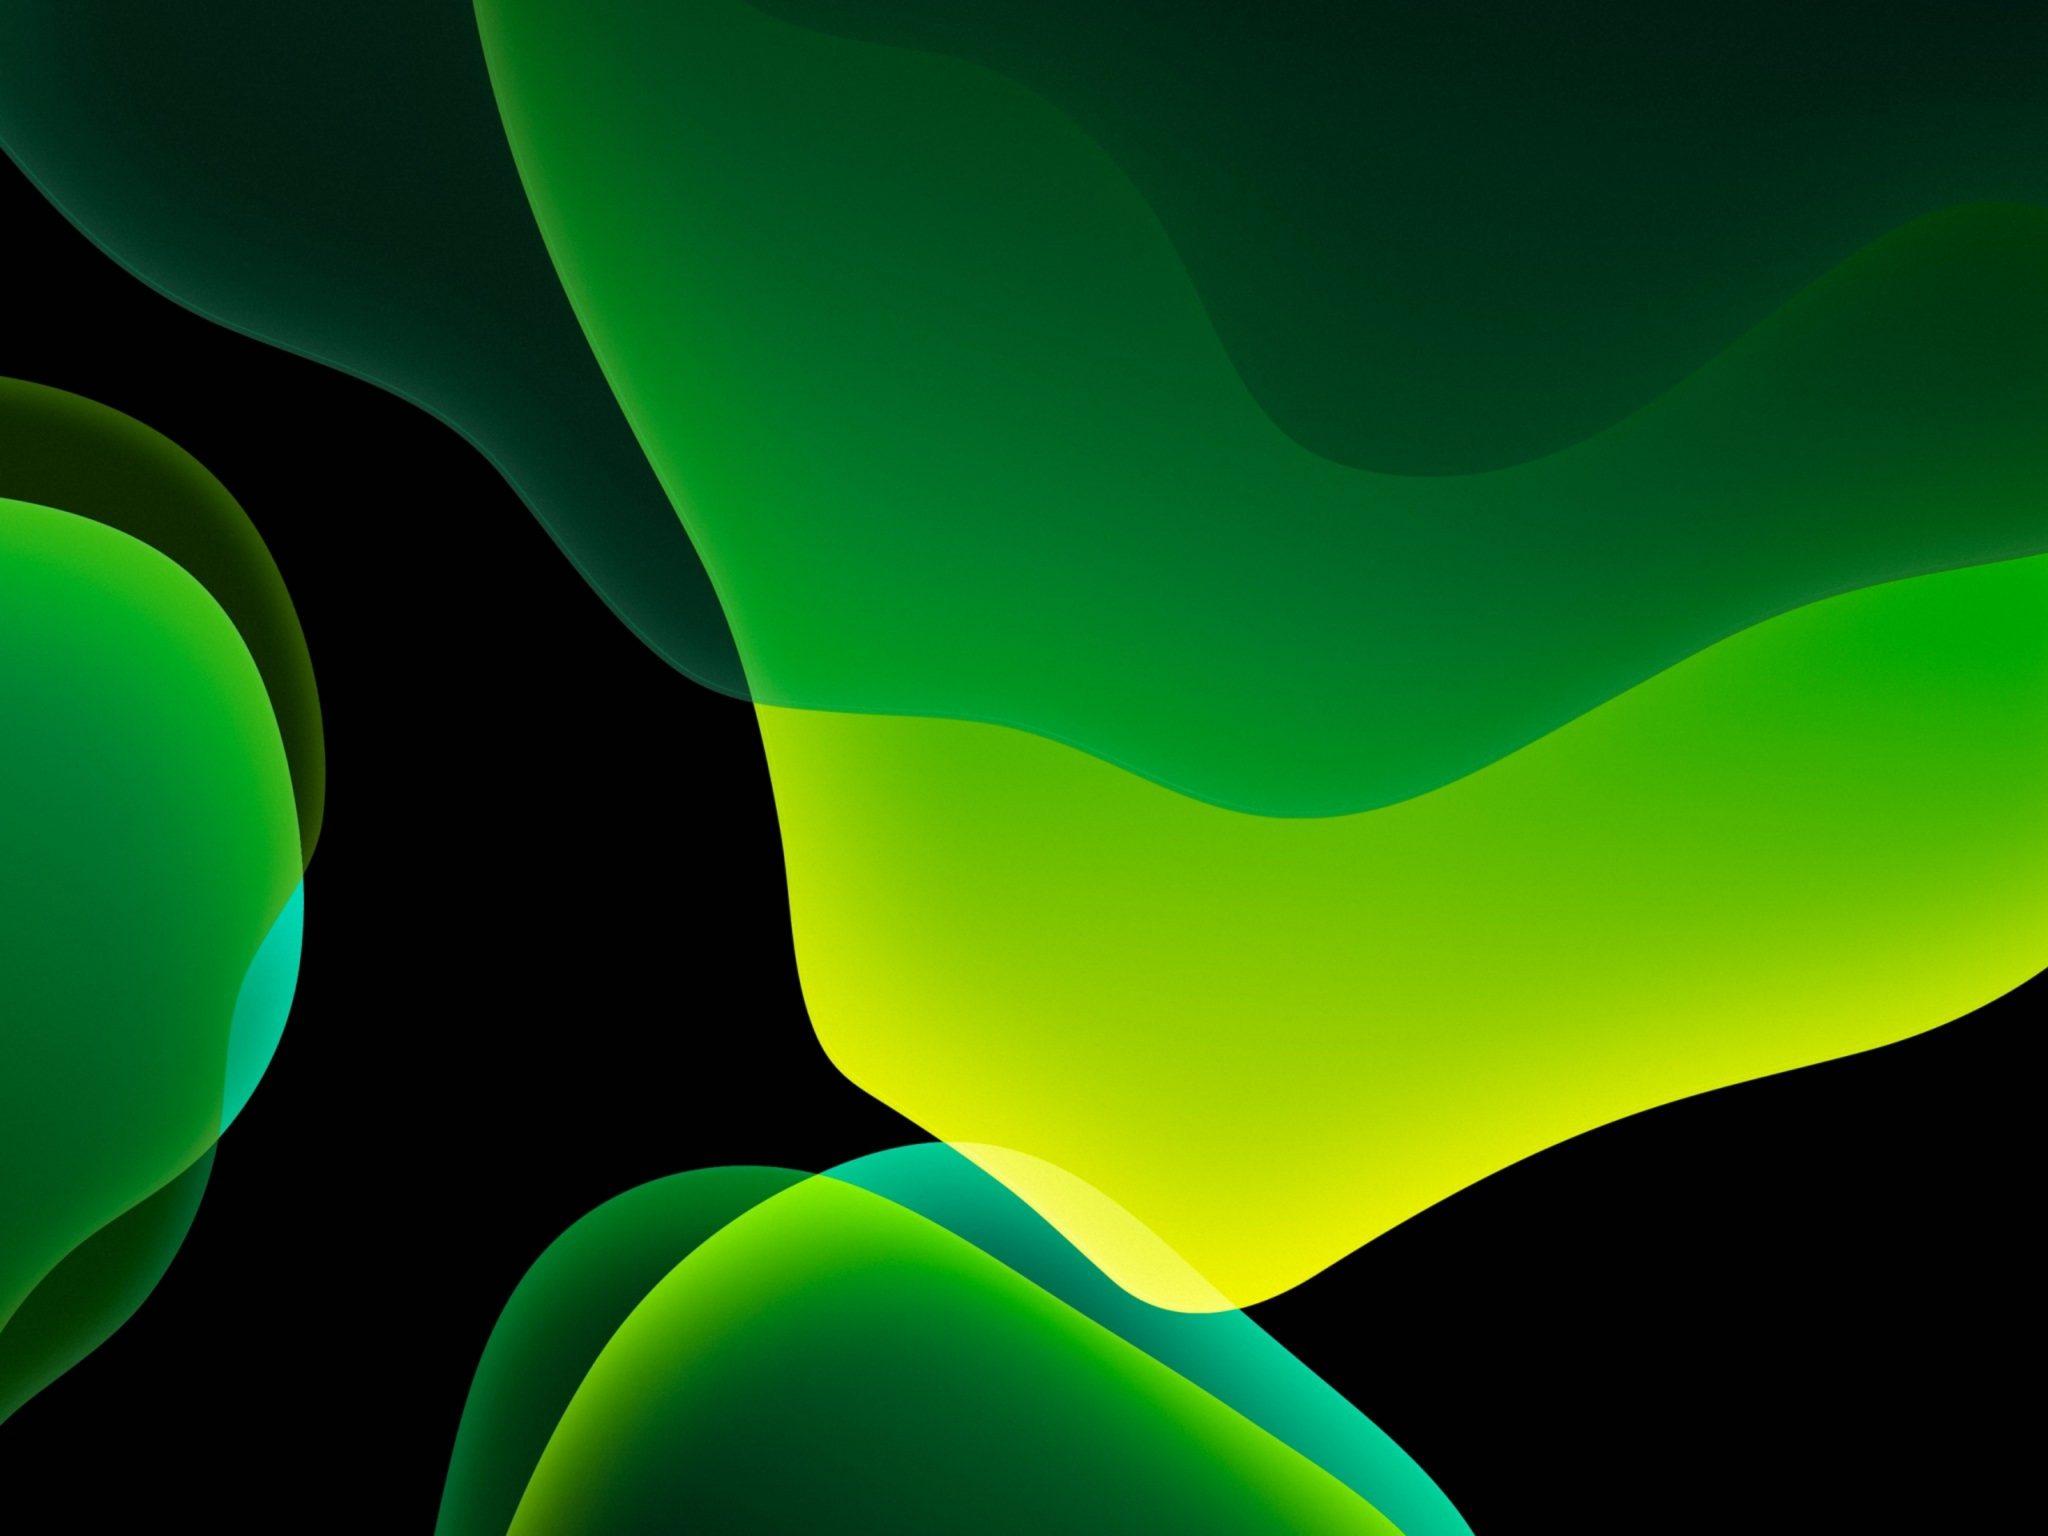 2048x1536 wallpaper Green Dark Ipados Ipad Wallpaper 2048x1536 pixels resolution